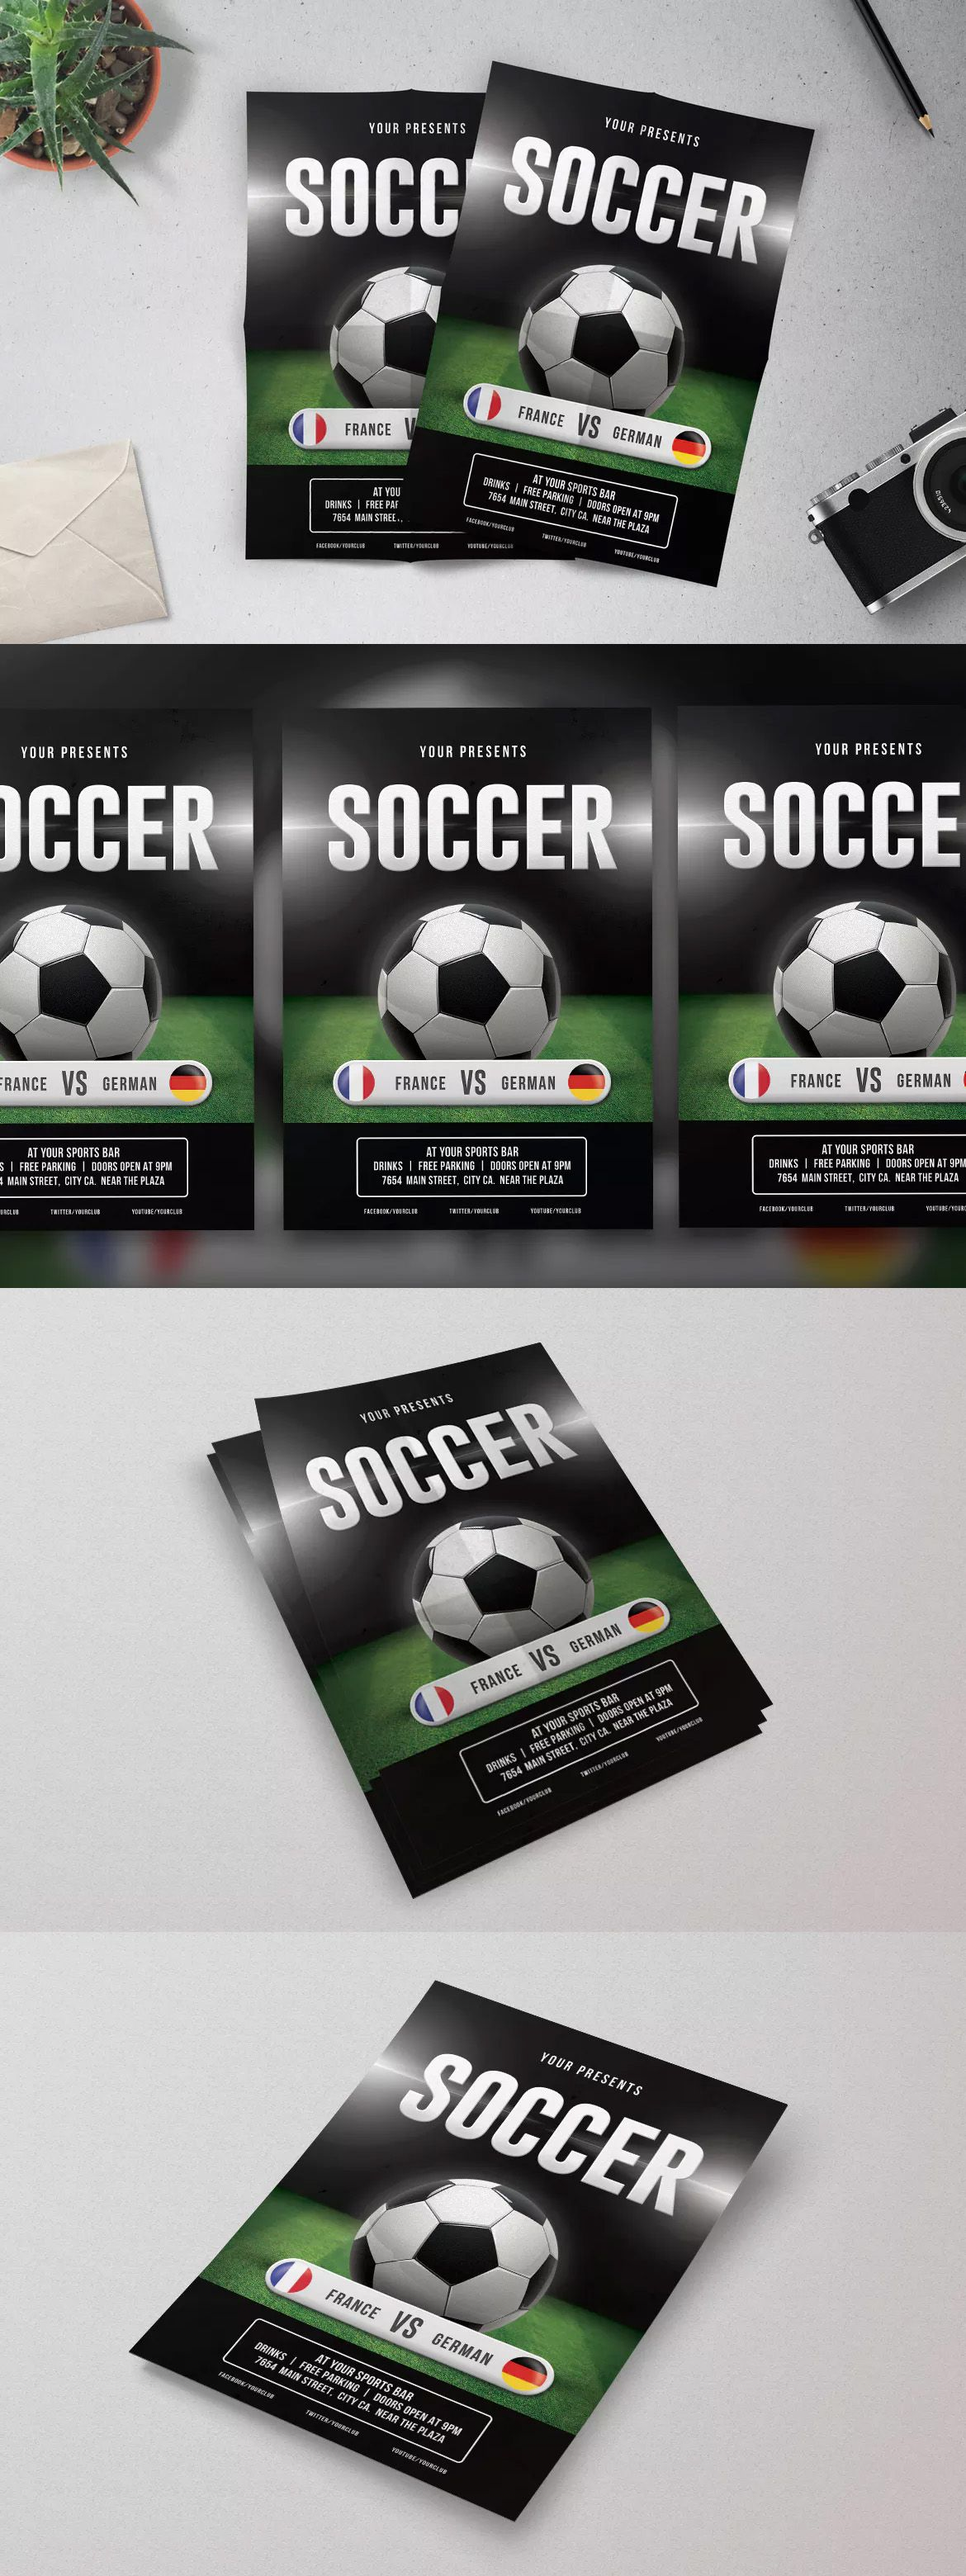 Soccer Flyer Template Psd  Flyer Templates    Flyer